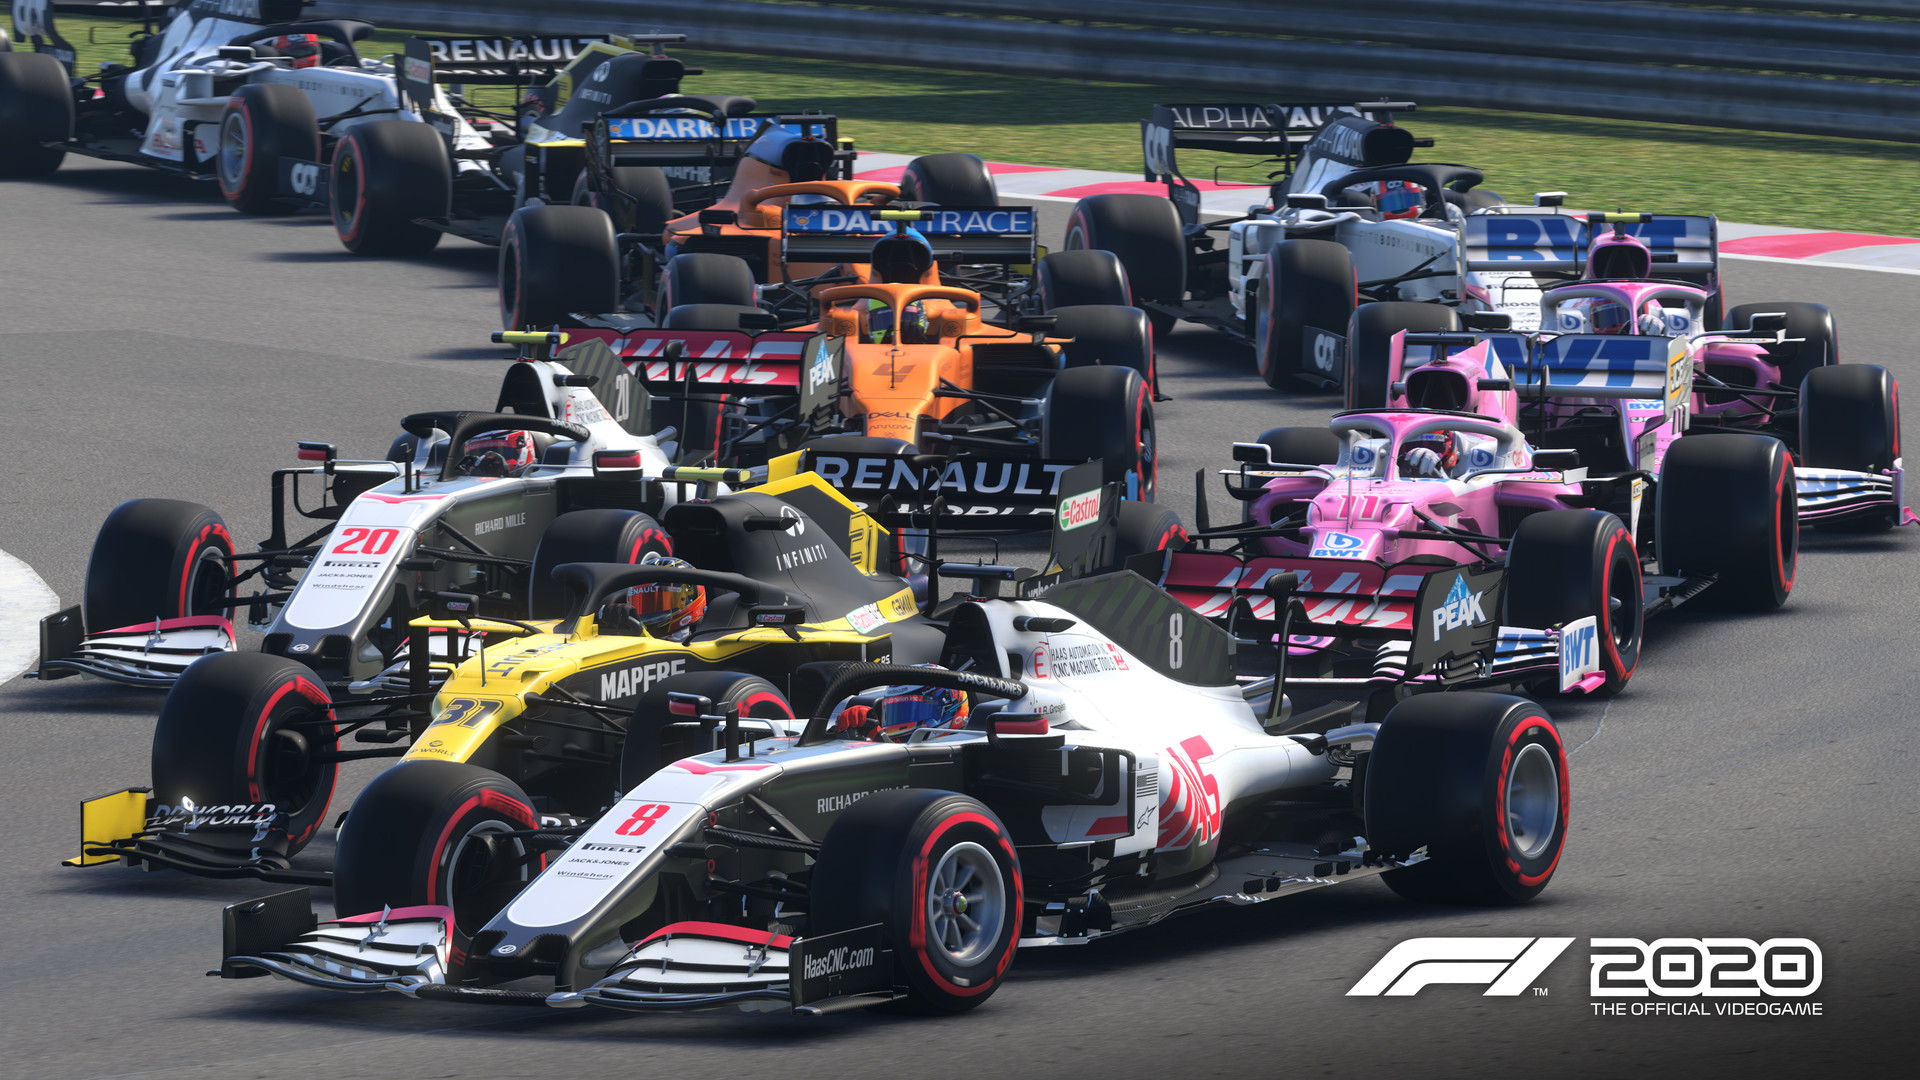 F1 2020 - średnia ocen 88/100